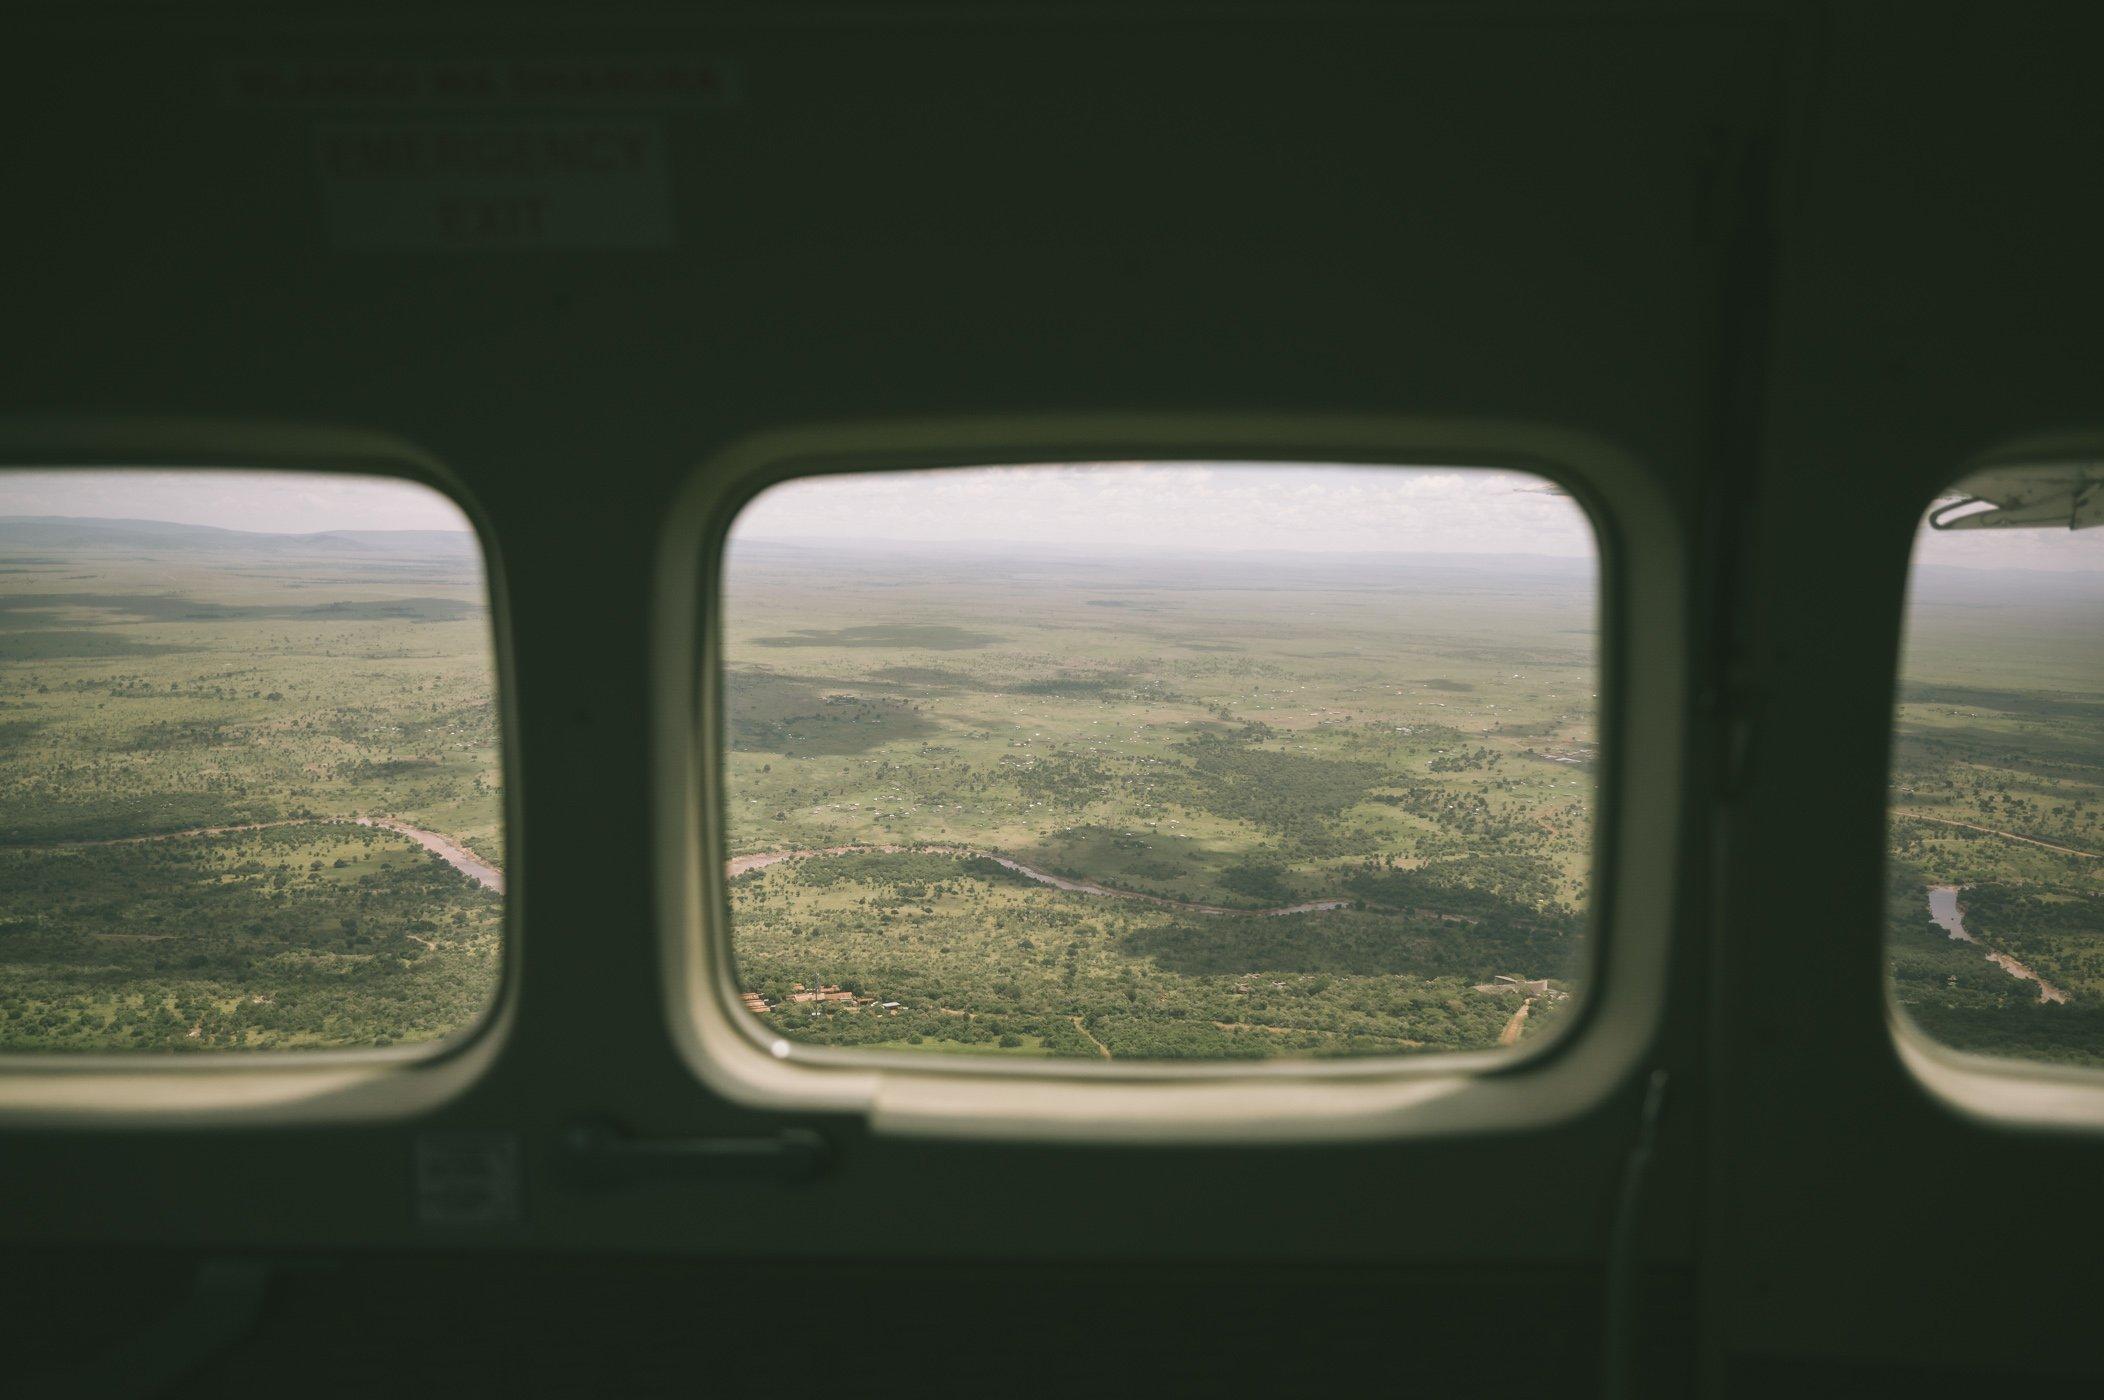 Arriving at the Maasai Mara by bush plane